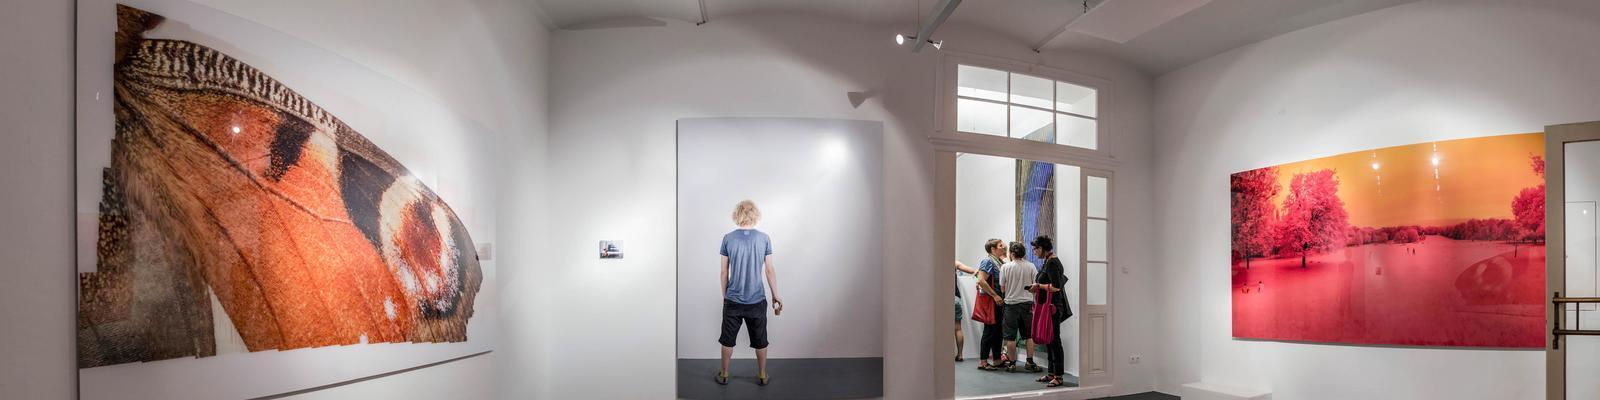 Galerie Reinthaler background